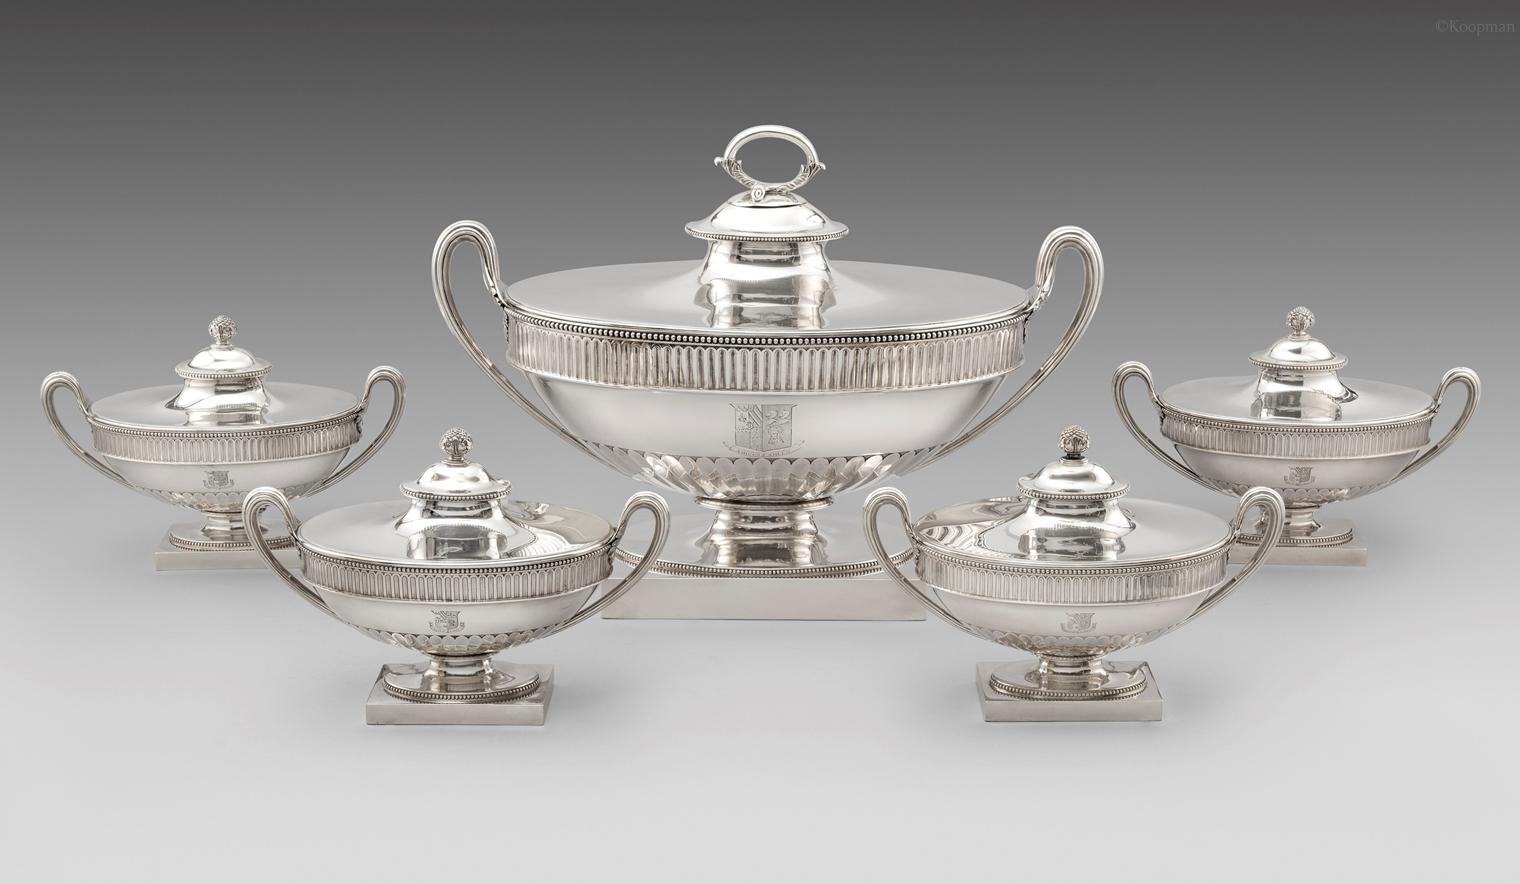 A George III Soup Tureen & Four Sauce Tureens En Suite